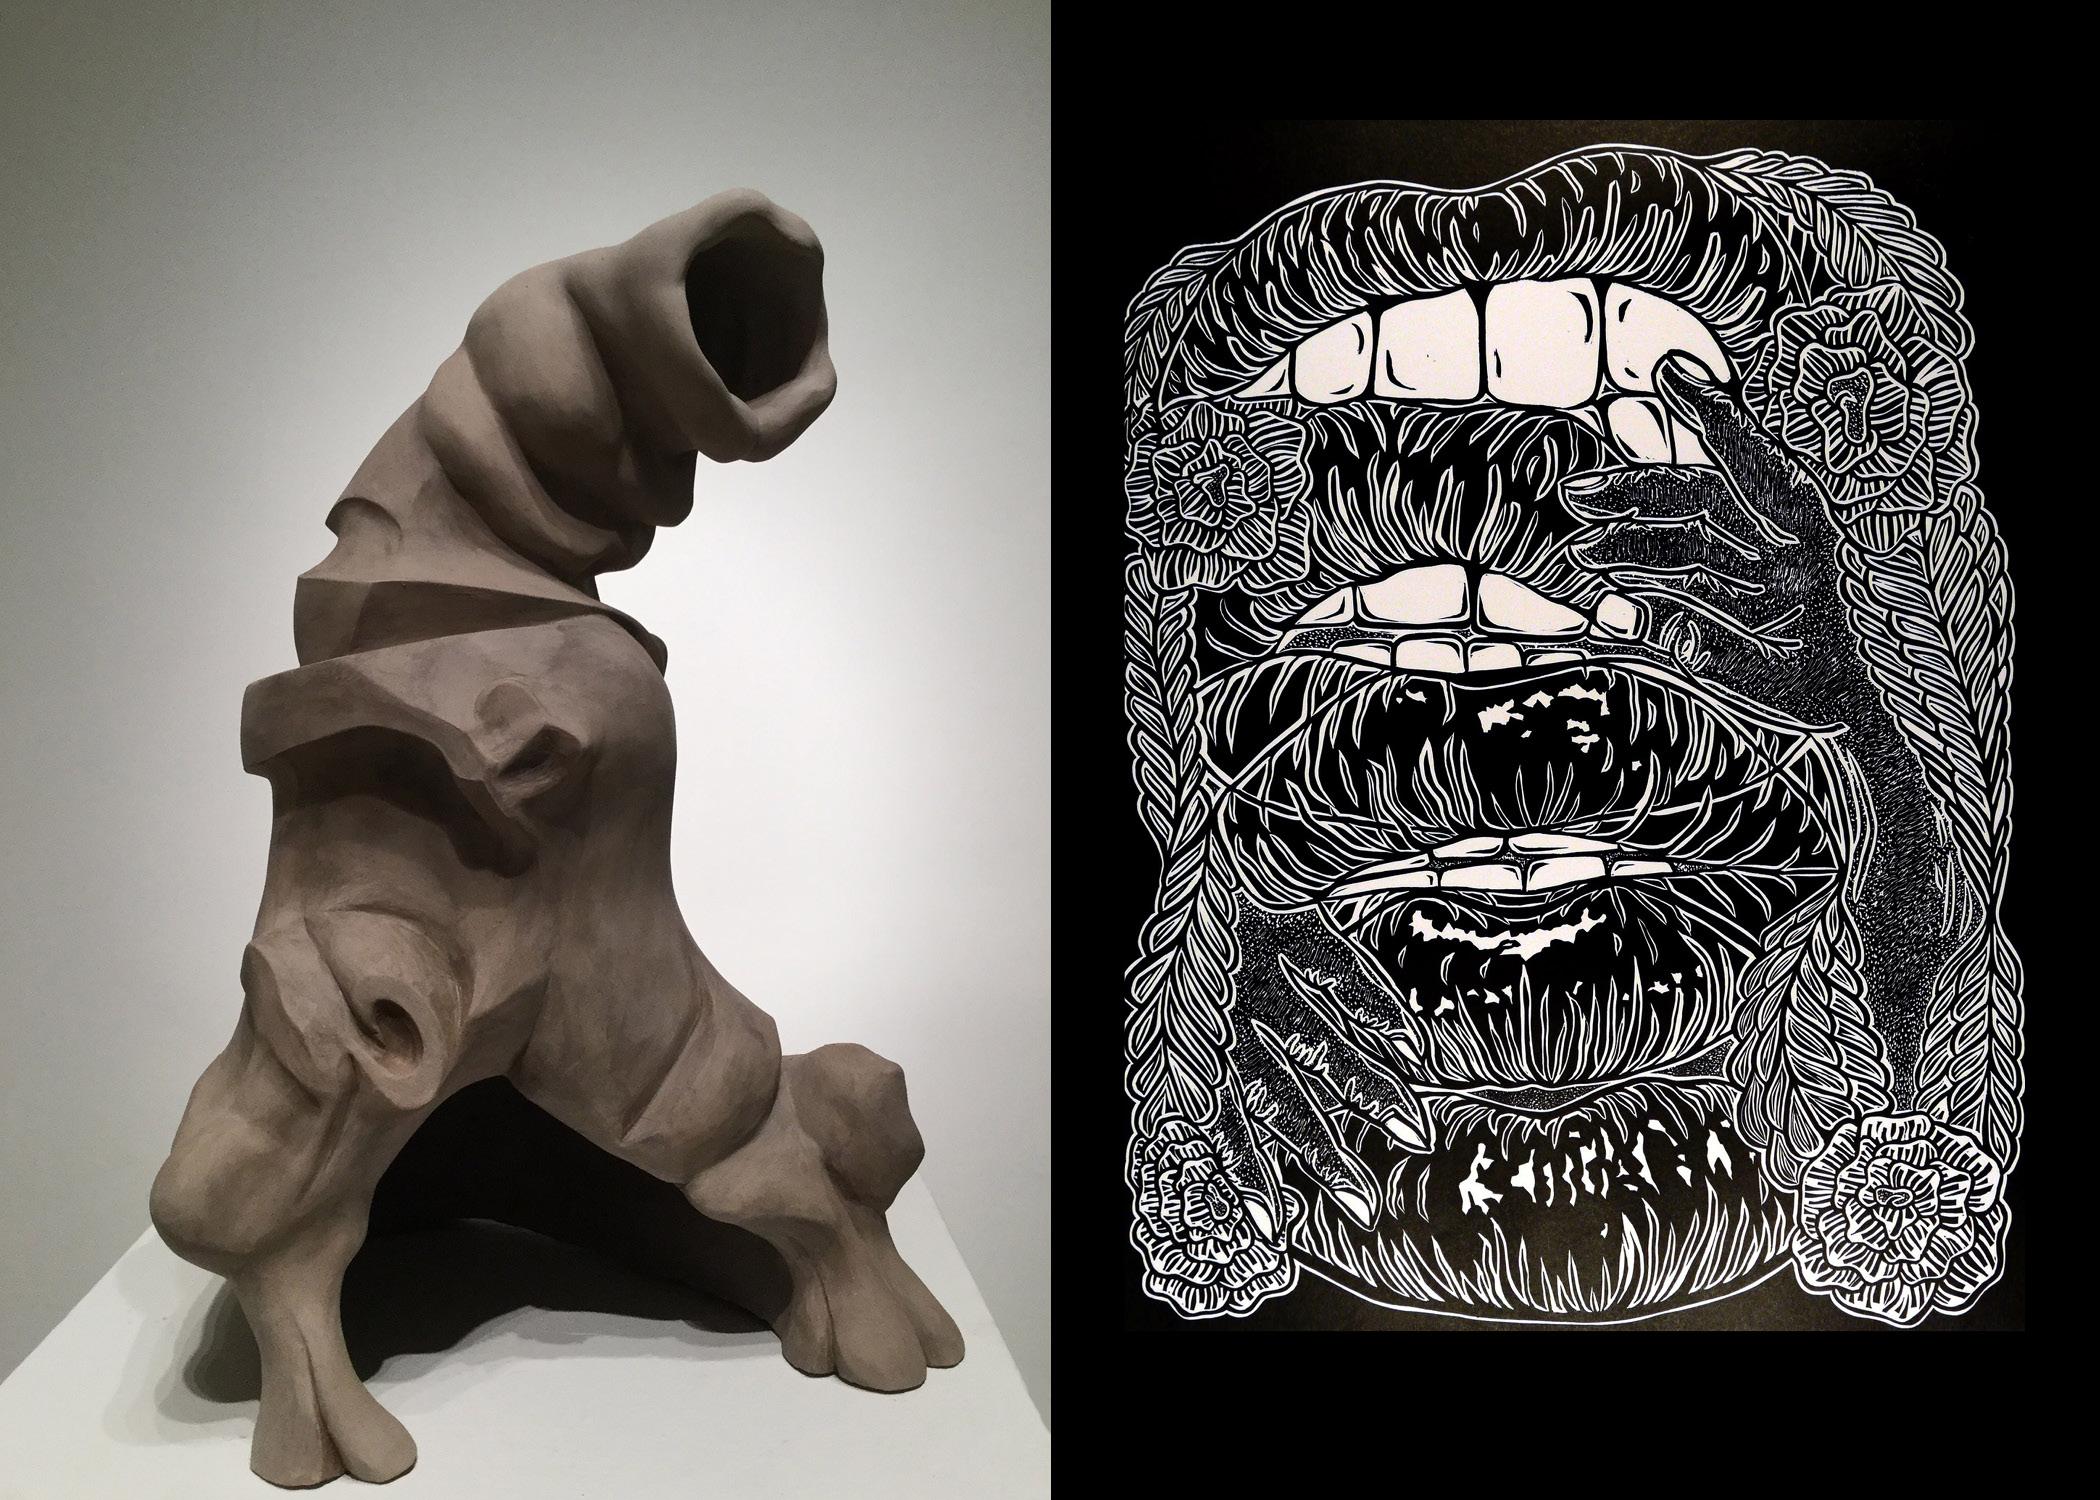 "Raw & Unfinished Business: Allie Gant and Jennifer Gault BFA Exhibition, Nov. 5-8, 2018, Sella-Granata Art Gallery. Left: Jennifer Gault, ""Temporary Love,"" 2016, 15 x 10 x 8 inches, unfired clay; right: Allie Gant, ""Lips,"" 2017, 22 x 30 inches, linoleum cut."